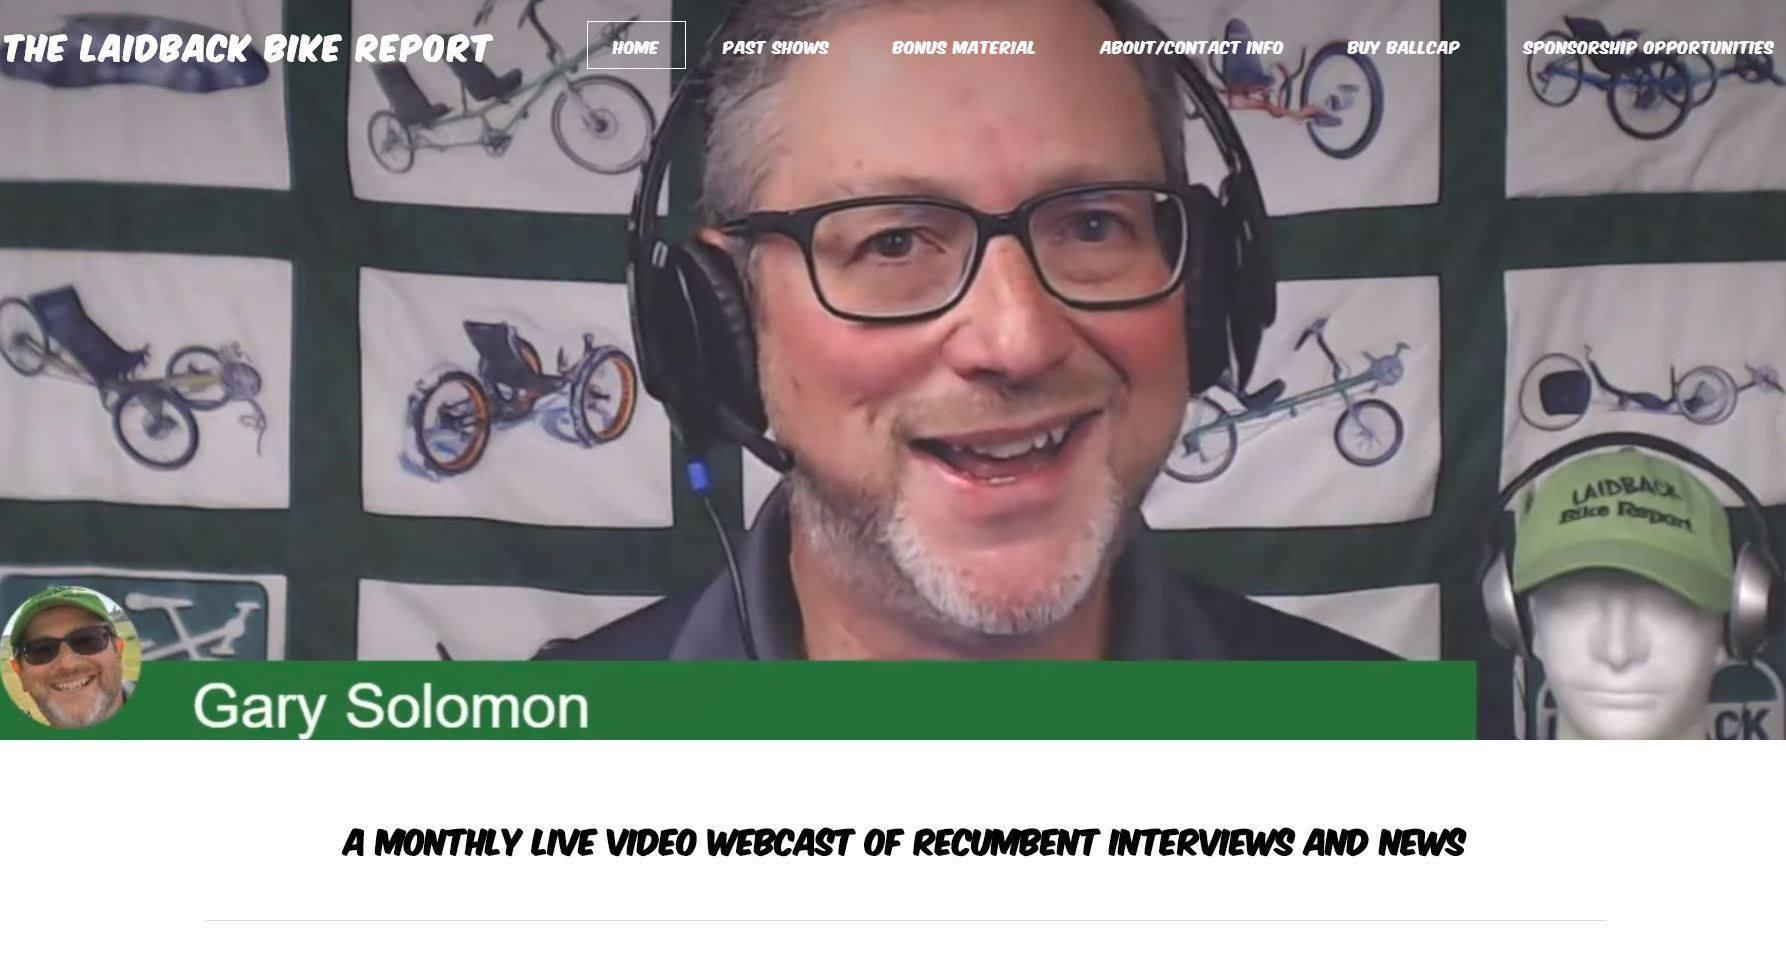 Gary Solomon Laidback Bike Report